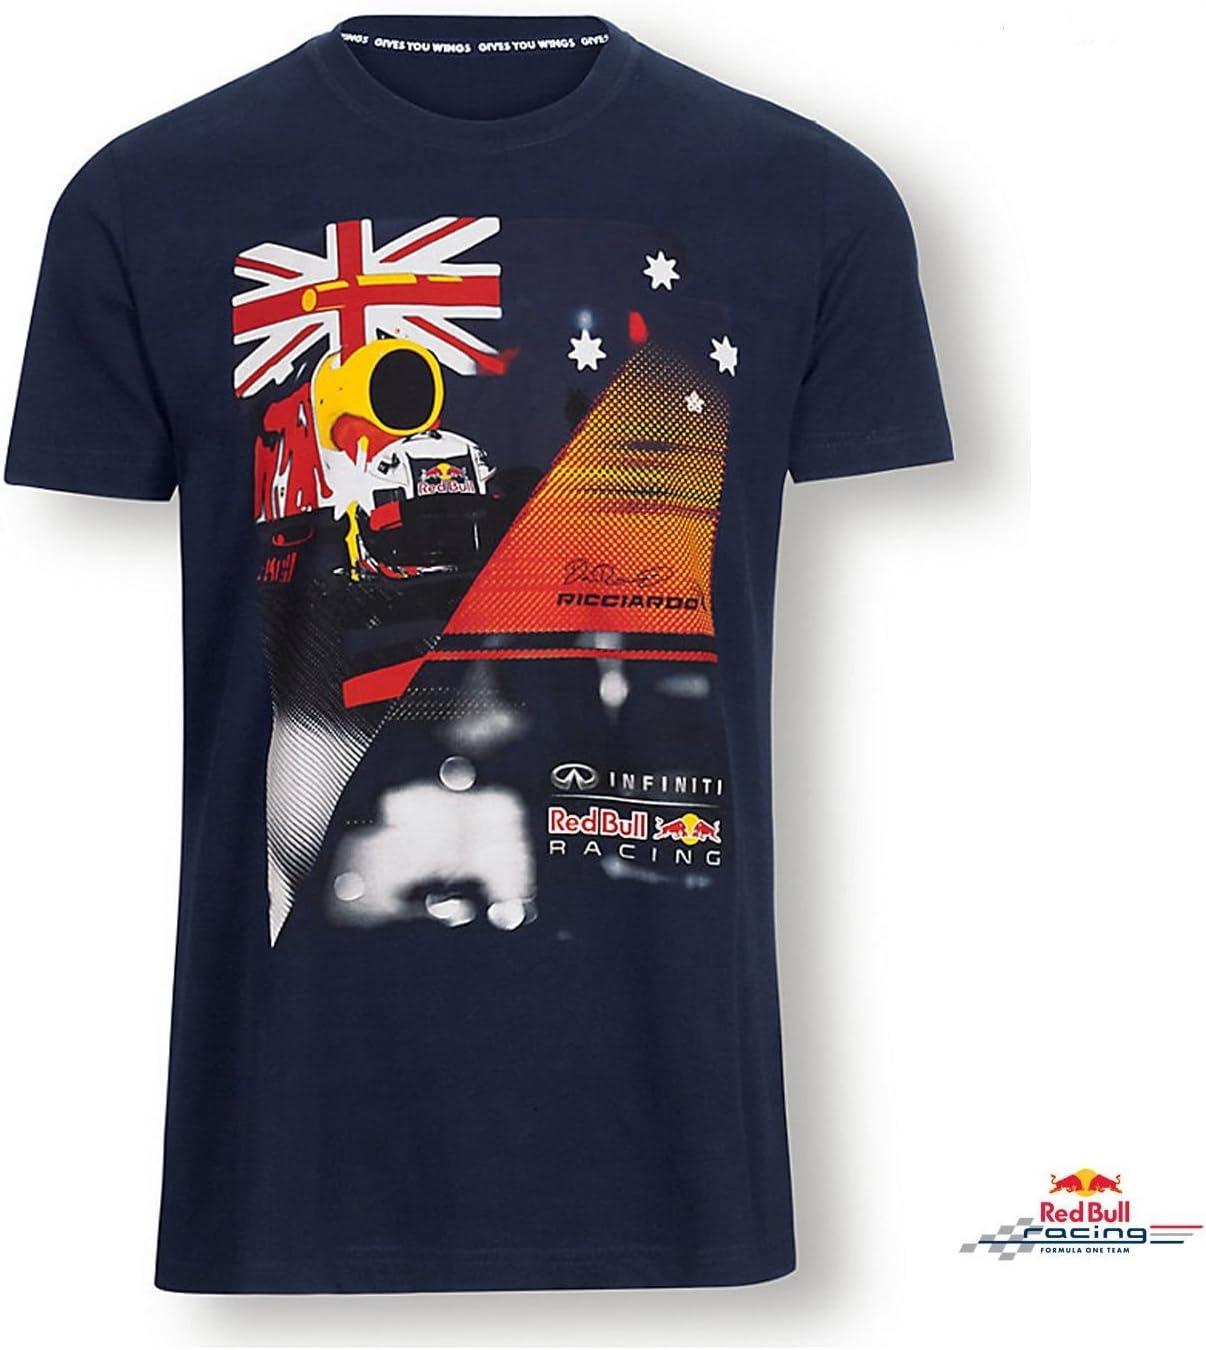 Camiseta de piloto de formula 1 Infiniti Red Bull Racing Team de Ricciardo , hombre, azul marino, X-Large: Amazon.es: Deportes y aire libre